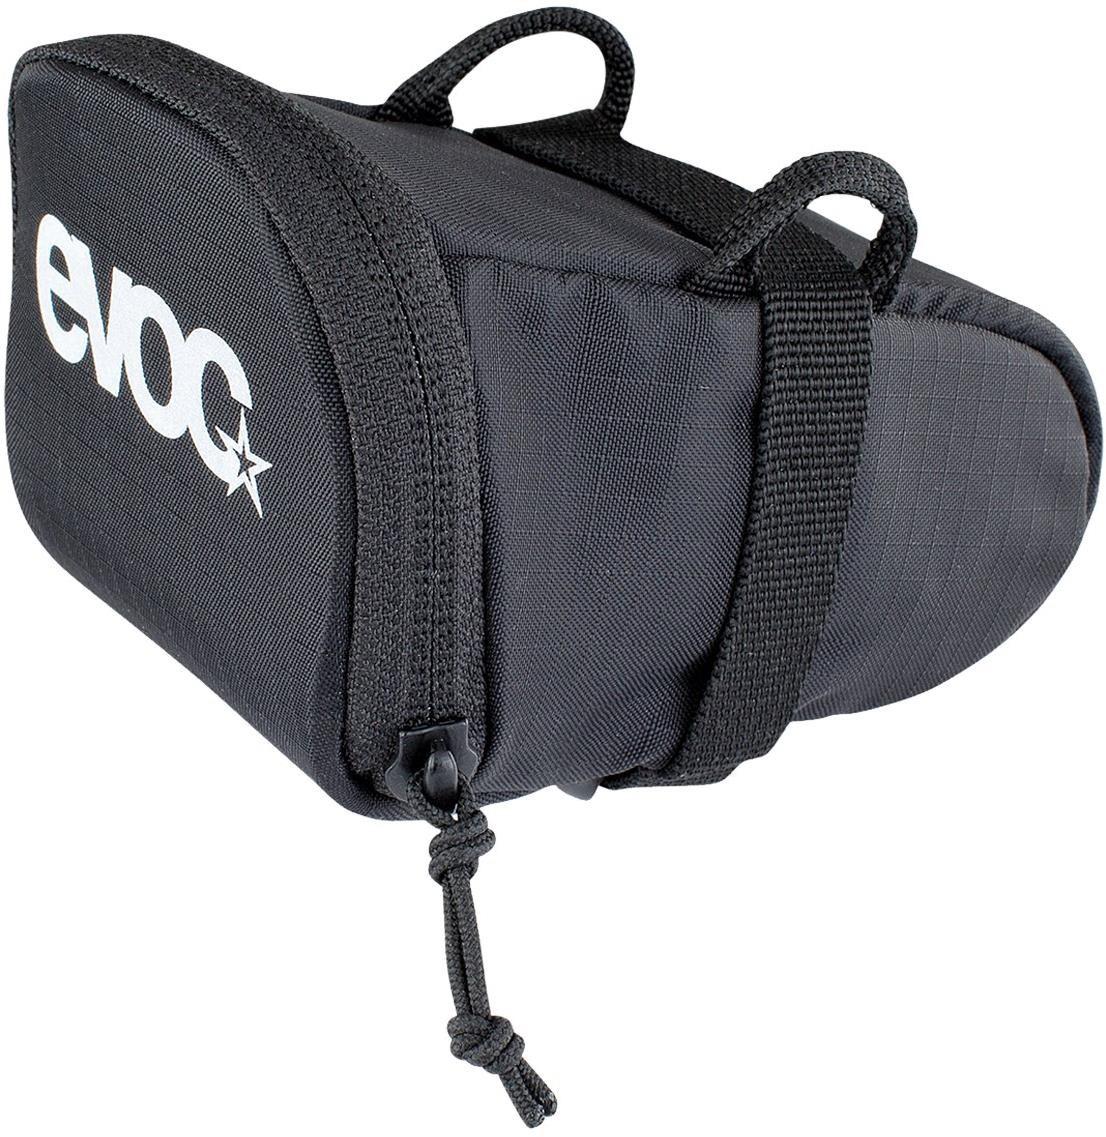 Evoc 0.3L Seat Bag   Saddle bags